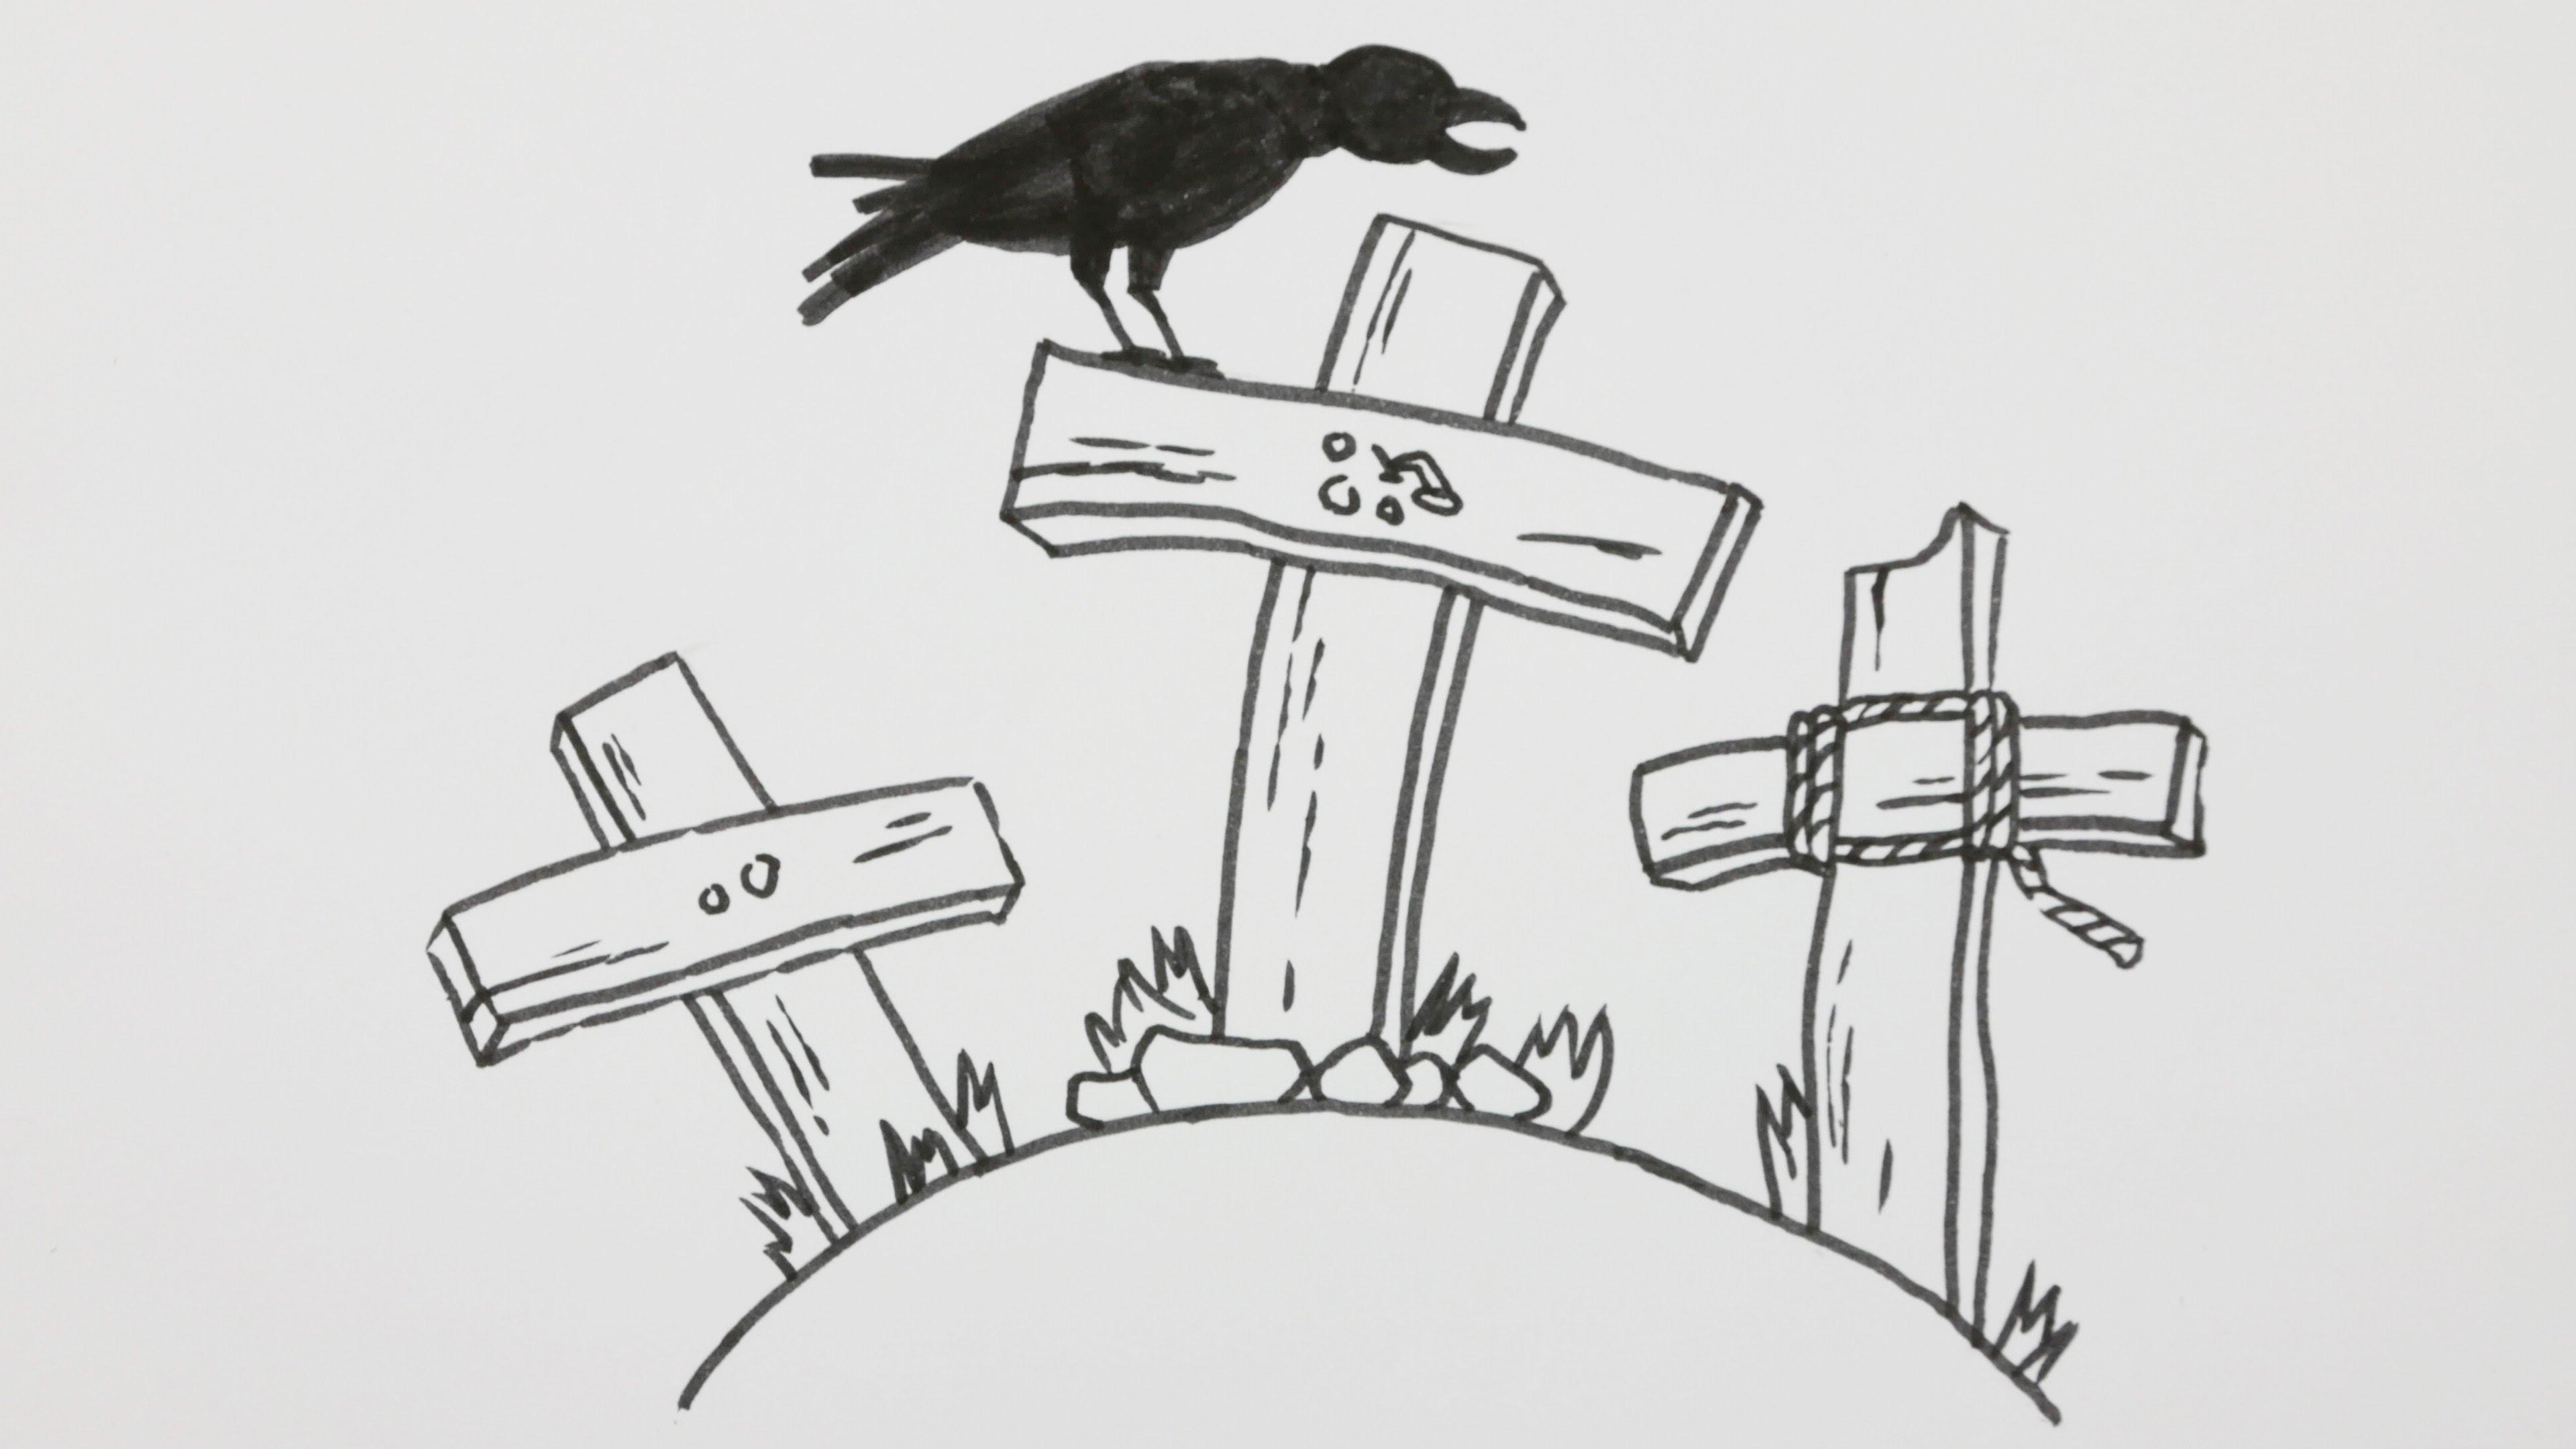 Drawn graveyard pencil drawing Comic Graveyard a to